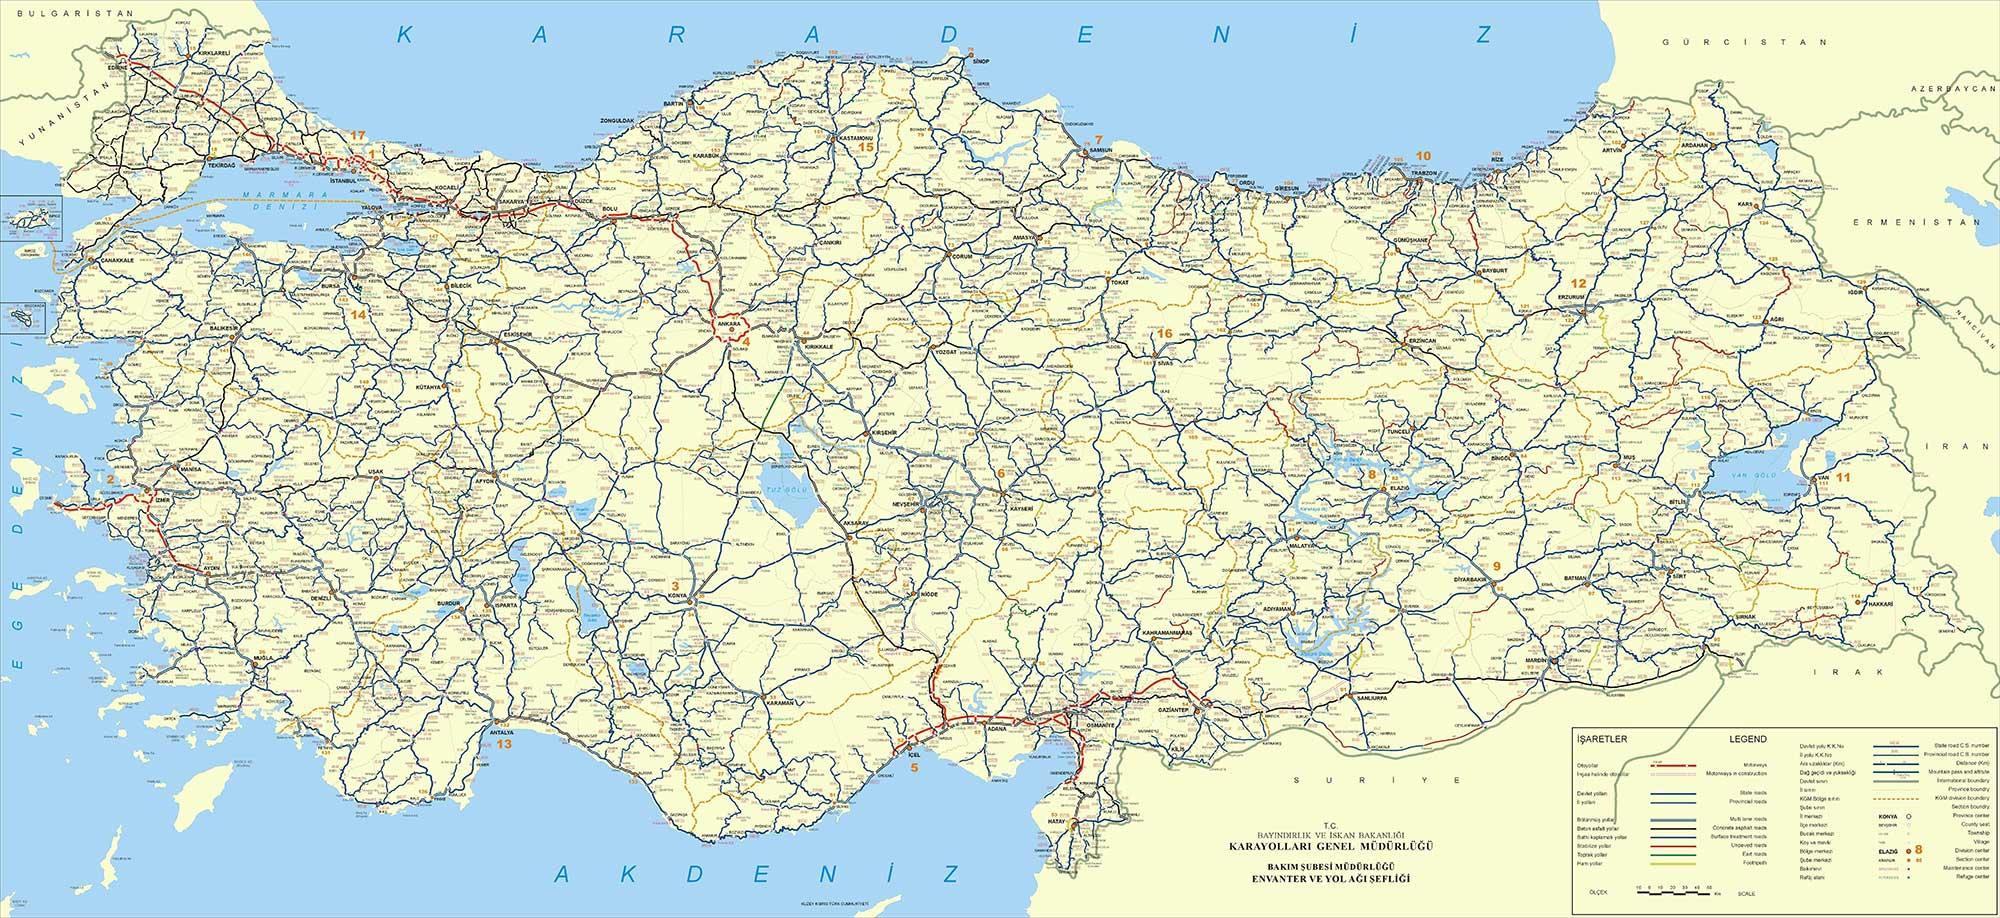 carte routiere turquie